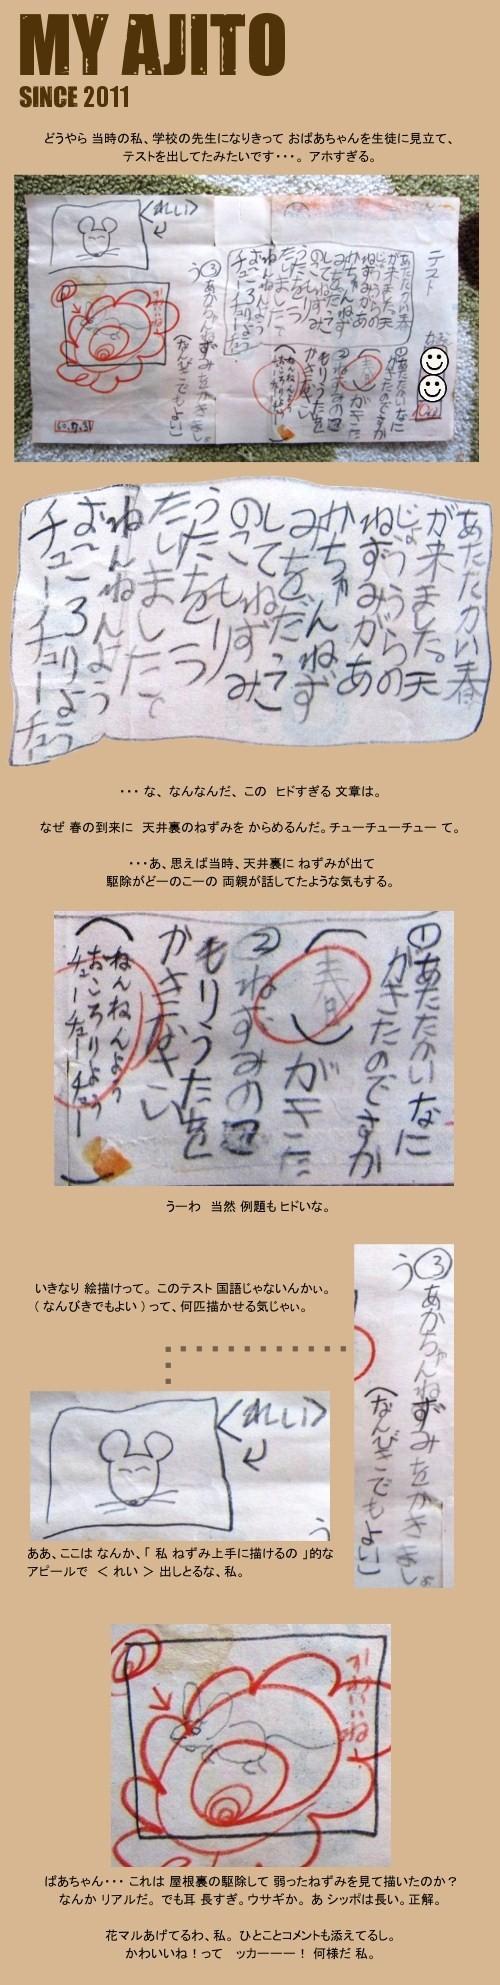 oshiba_2.jpg